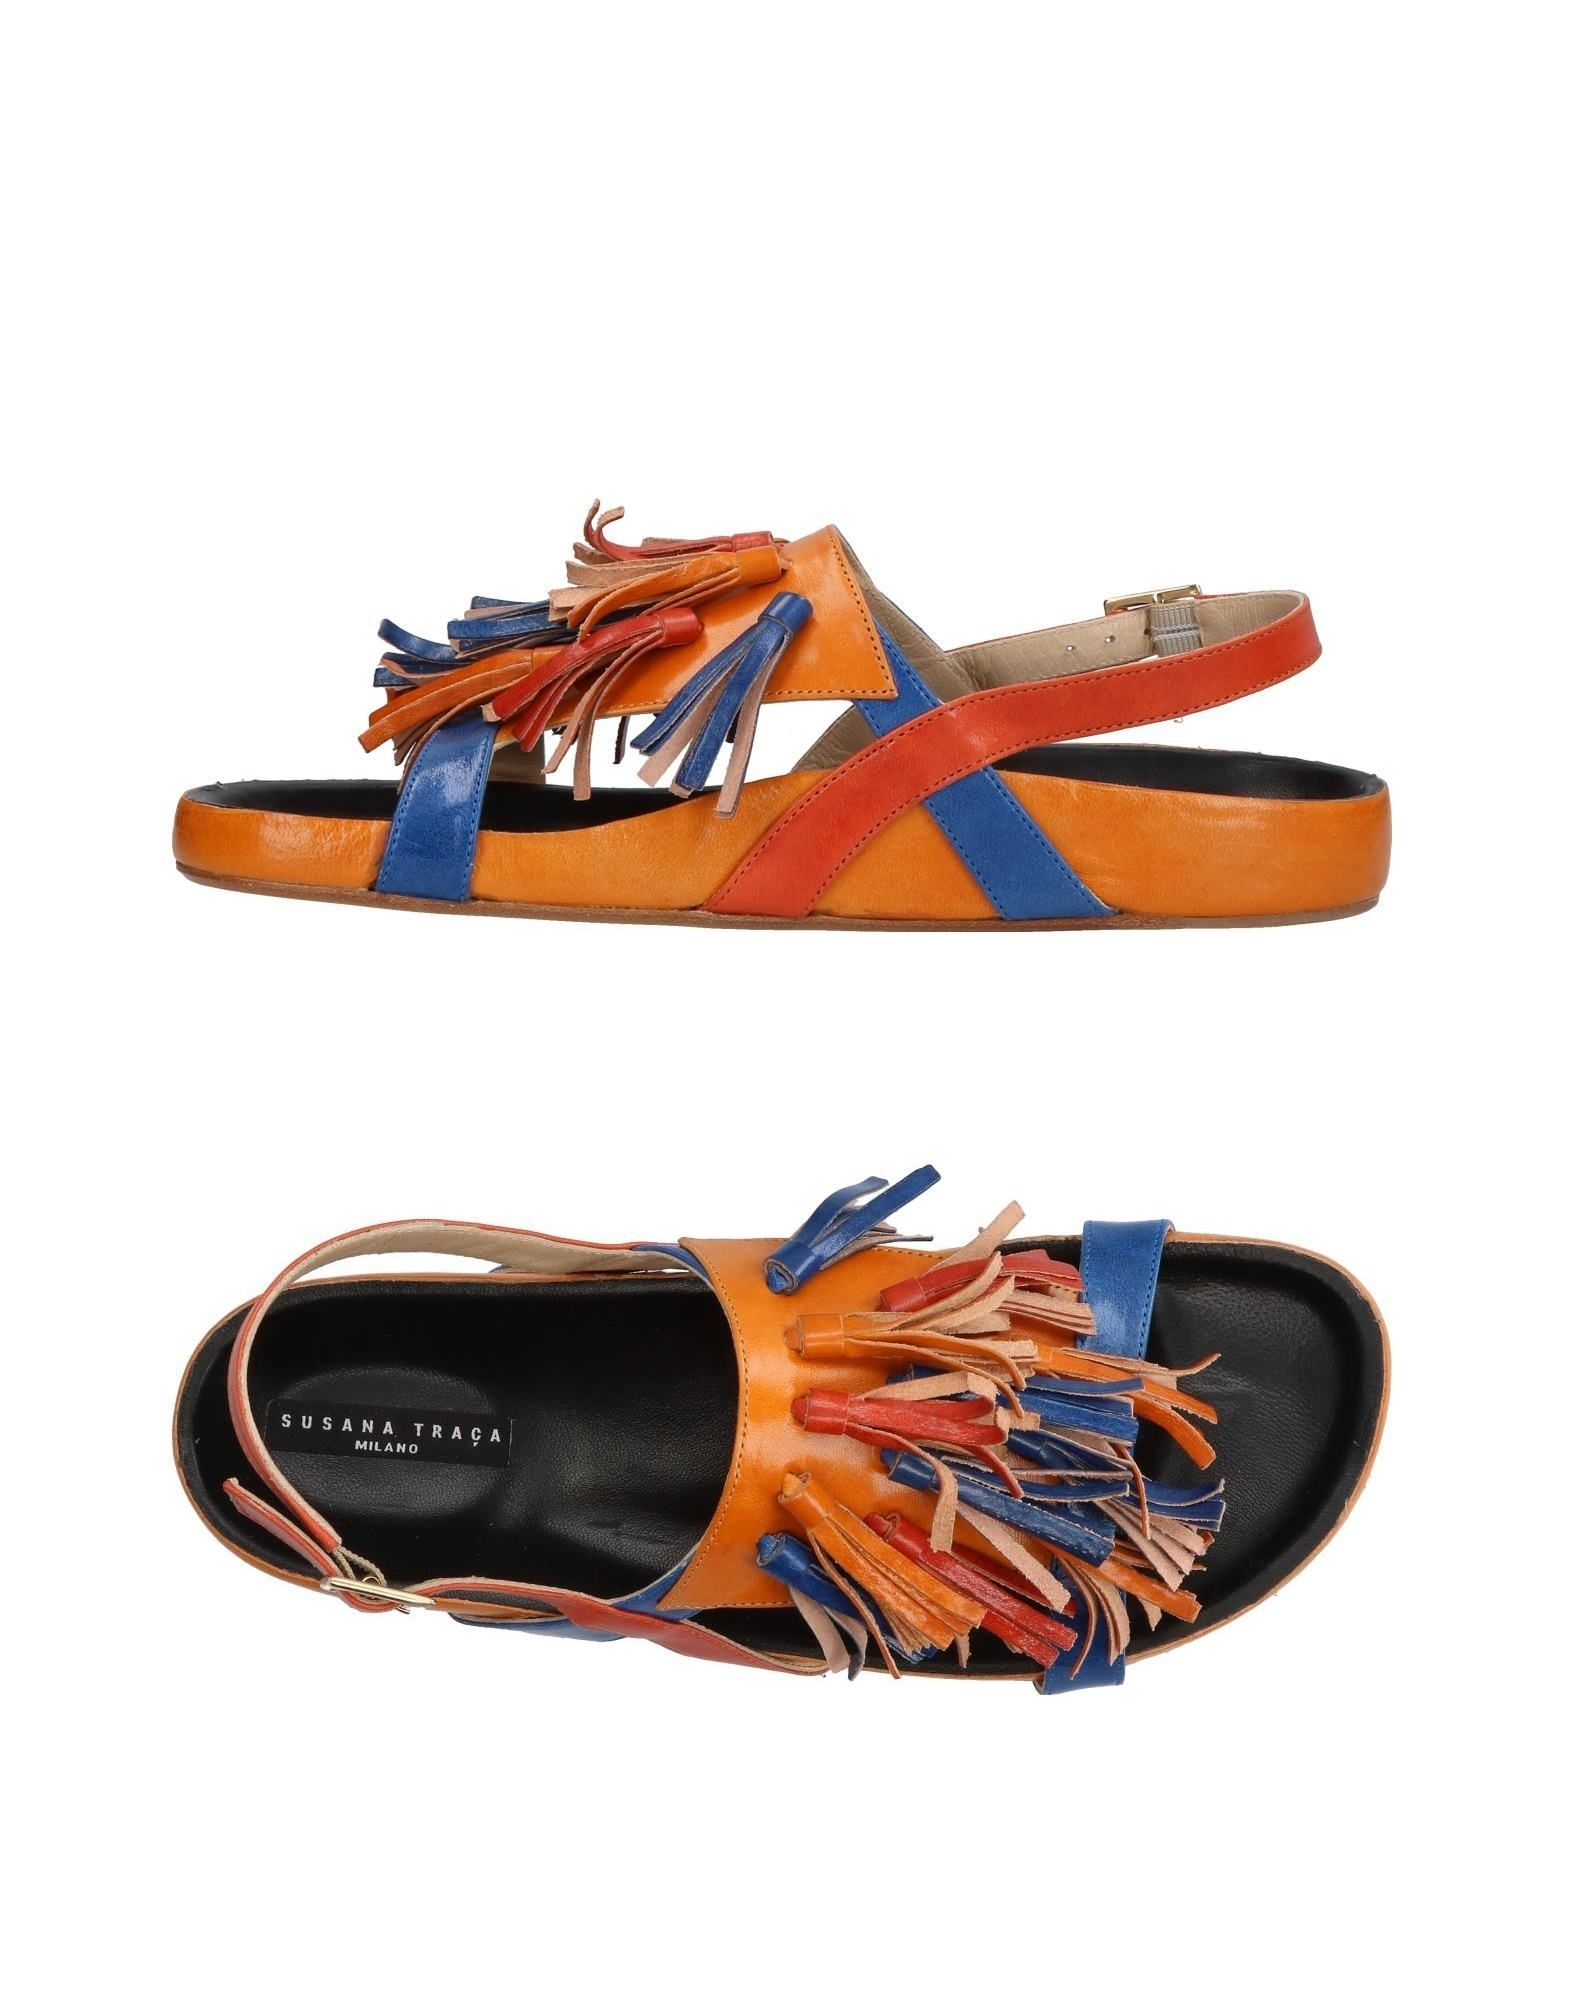 Stilvolle Traca billige Schuhe Susana Traca Stilvolle Sandalen Damen  11356149JC d92eba